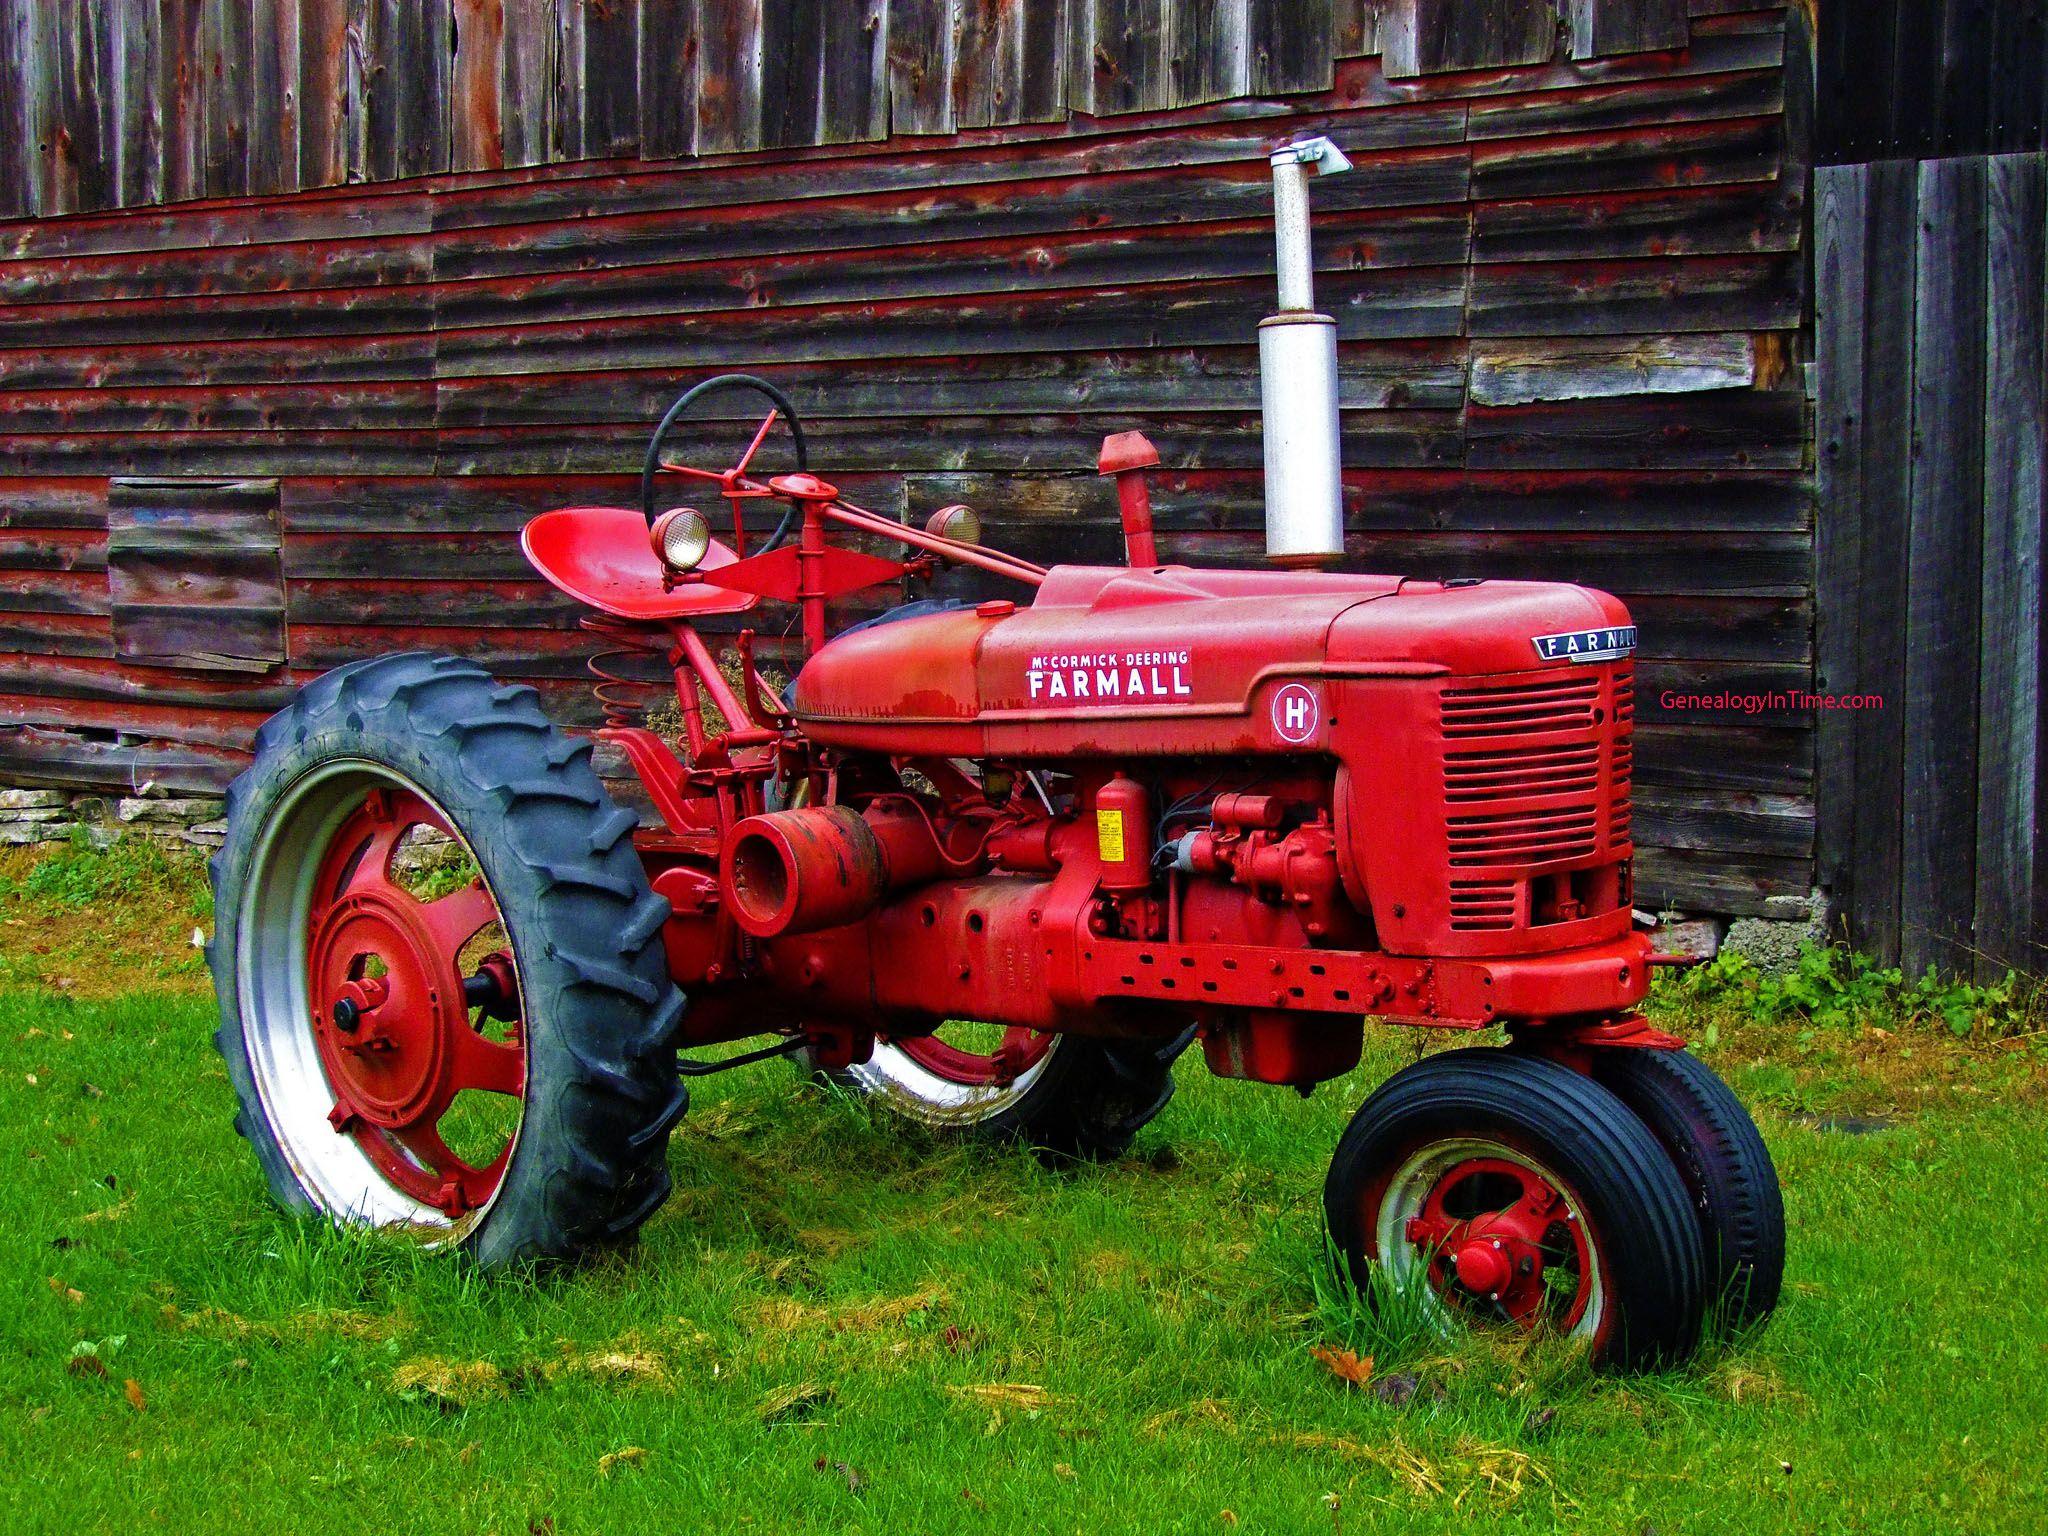 agriculture and tractor J agromedicine 201419(1):5-14 doi: 101080/1059924x2013855690  perceptions of tilt angles of an agricultural tractor görücü s(1), cavallo e,  murphy d.